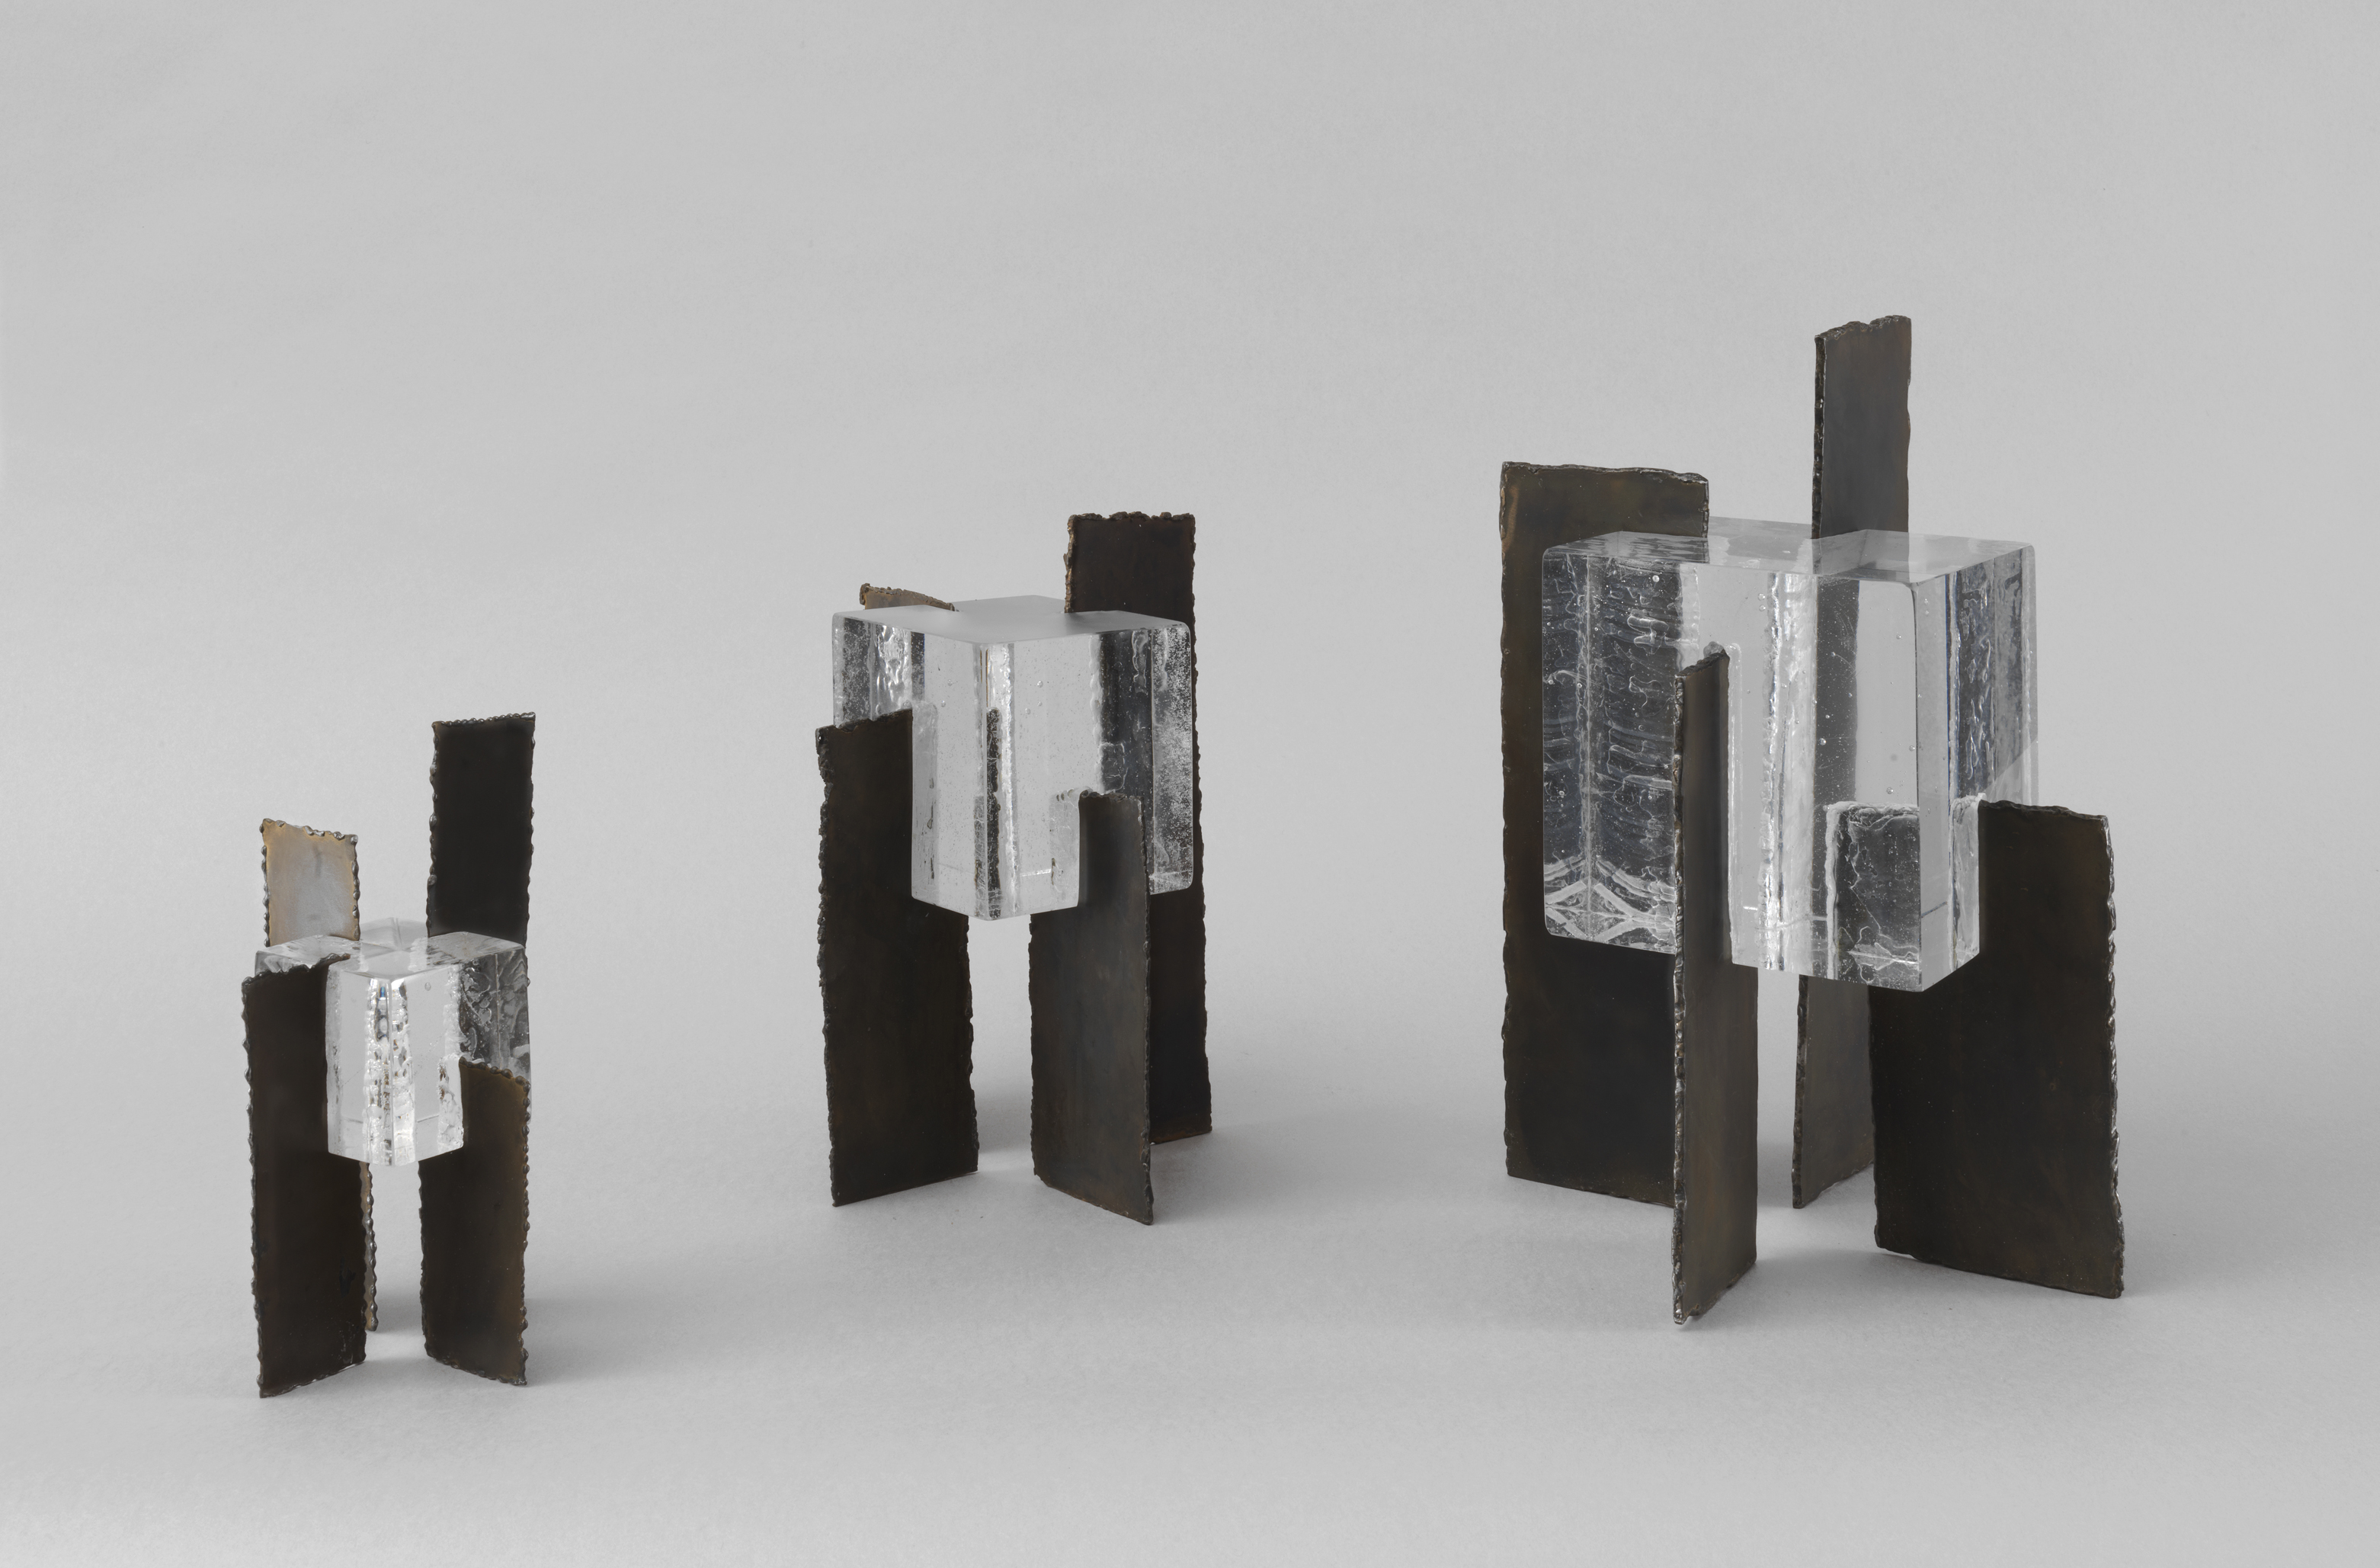 FANCHINI - Terra in vitro 1 2 3